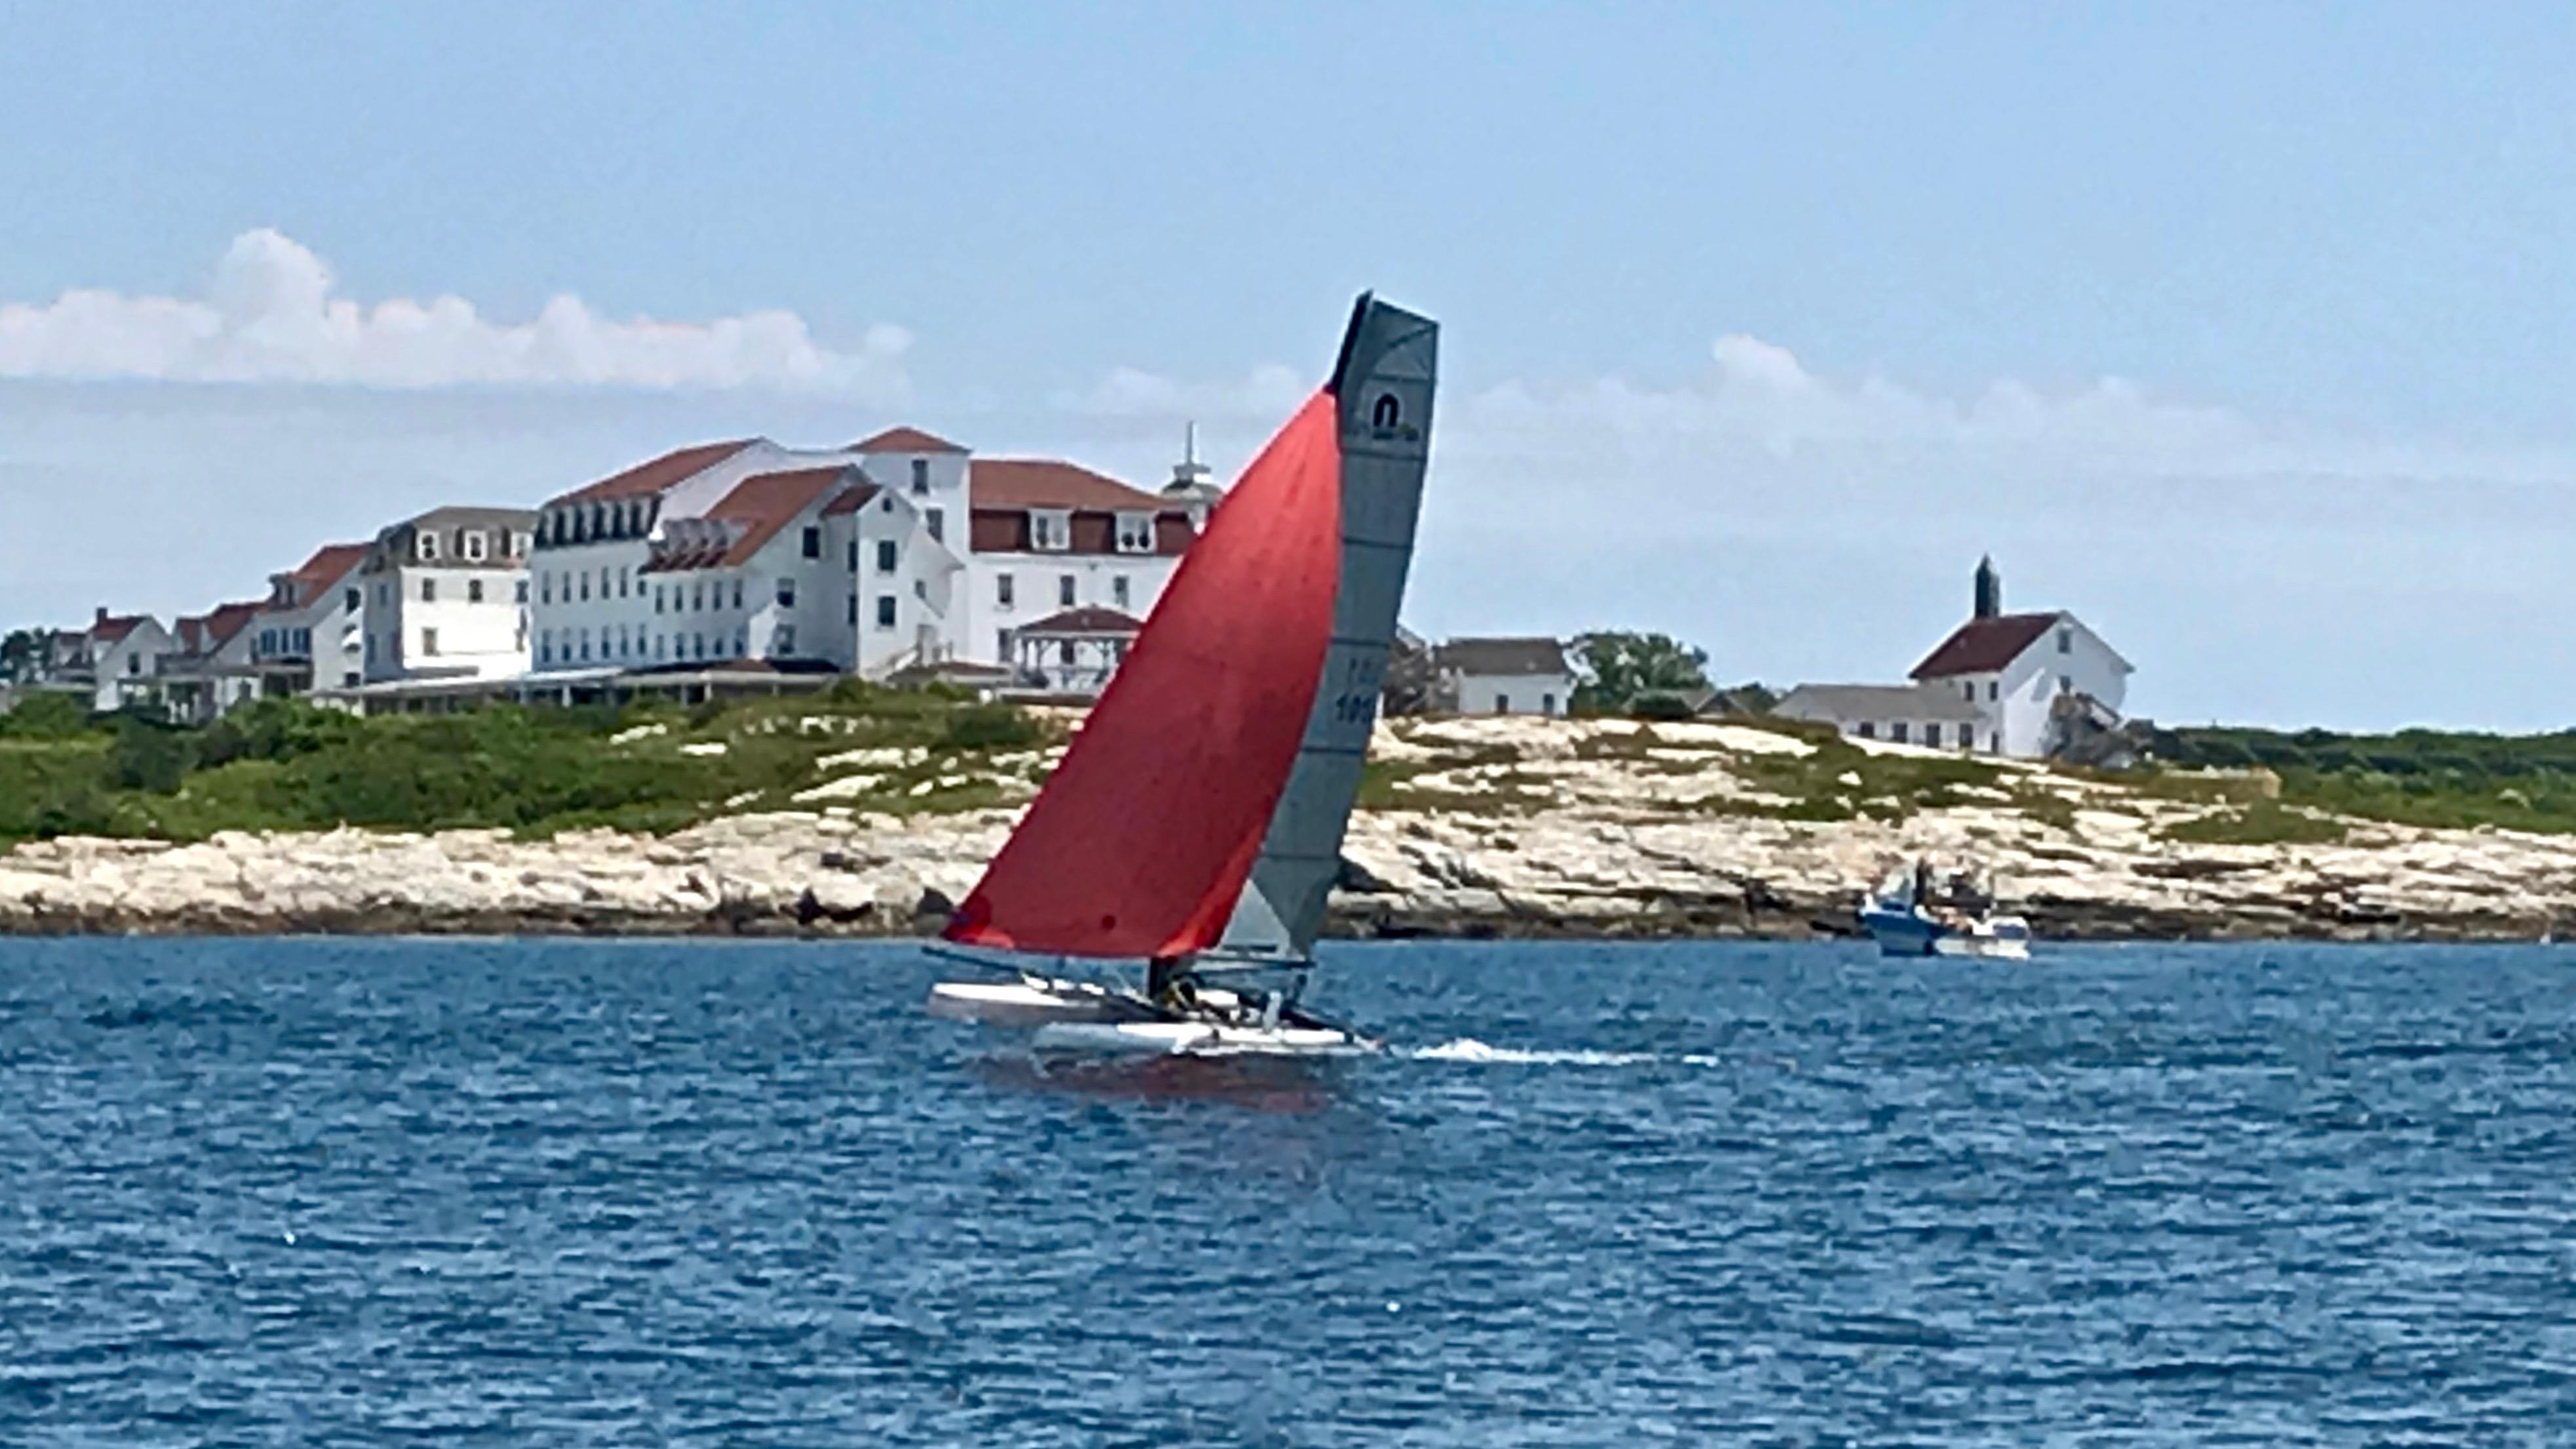 Isle of Shoals Sailing